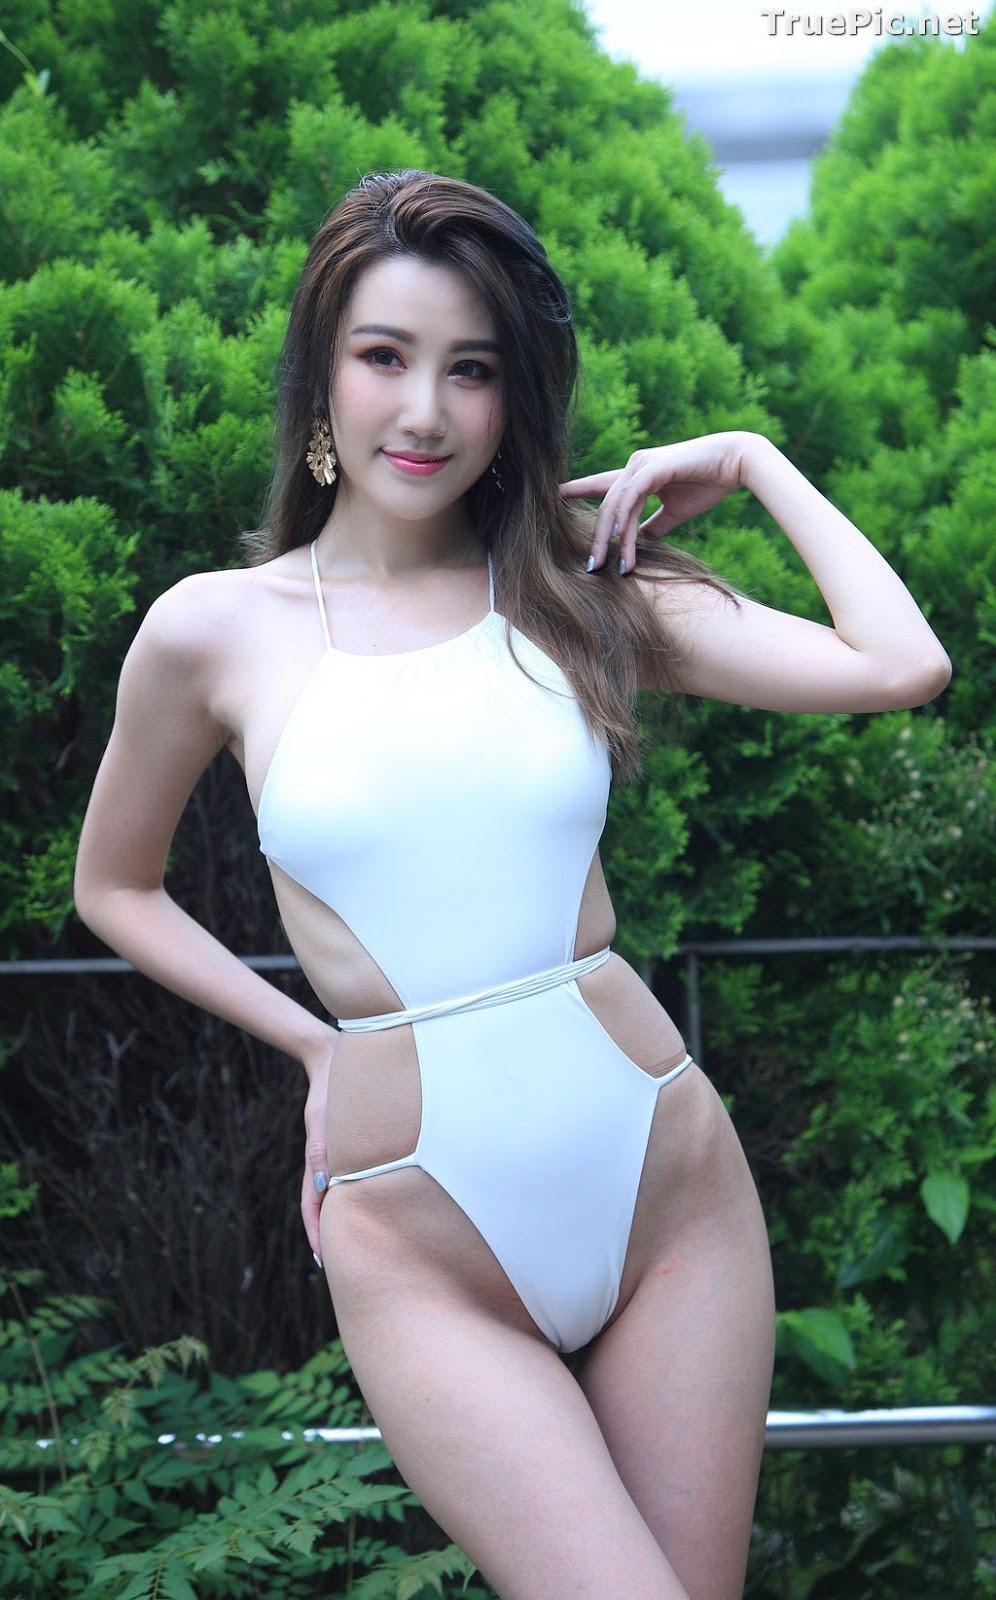 Image Taiwanese Beautiful Model - Suki - White Sexy Bikini Girl - TruePic.net - Picture-2